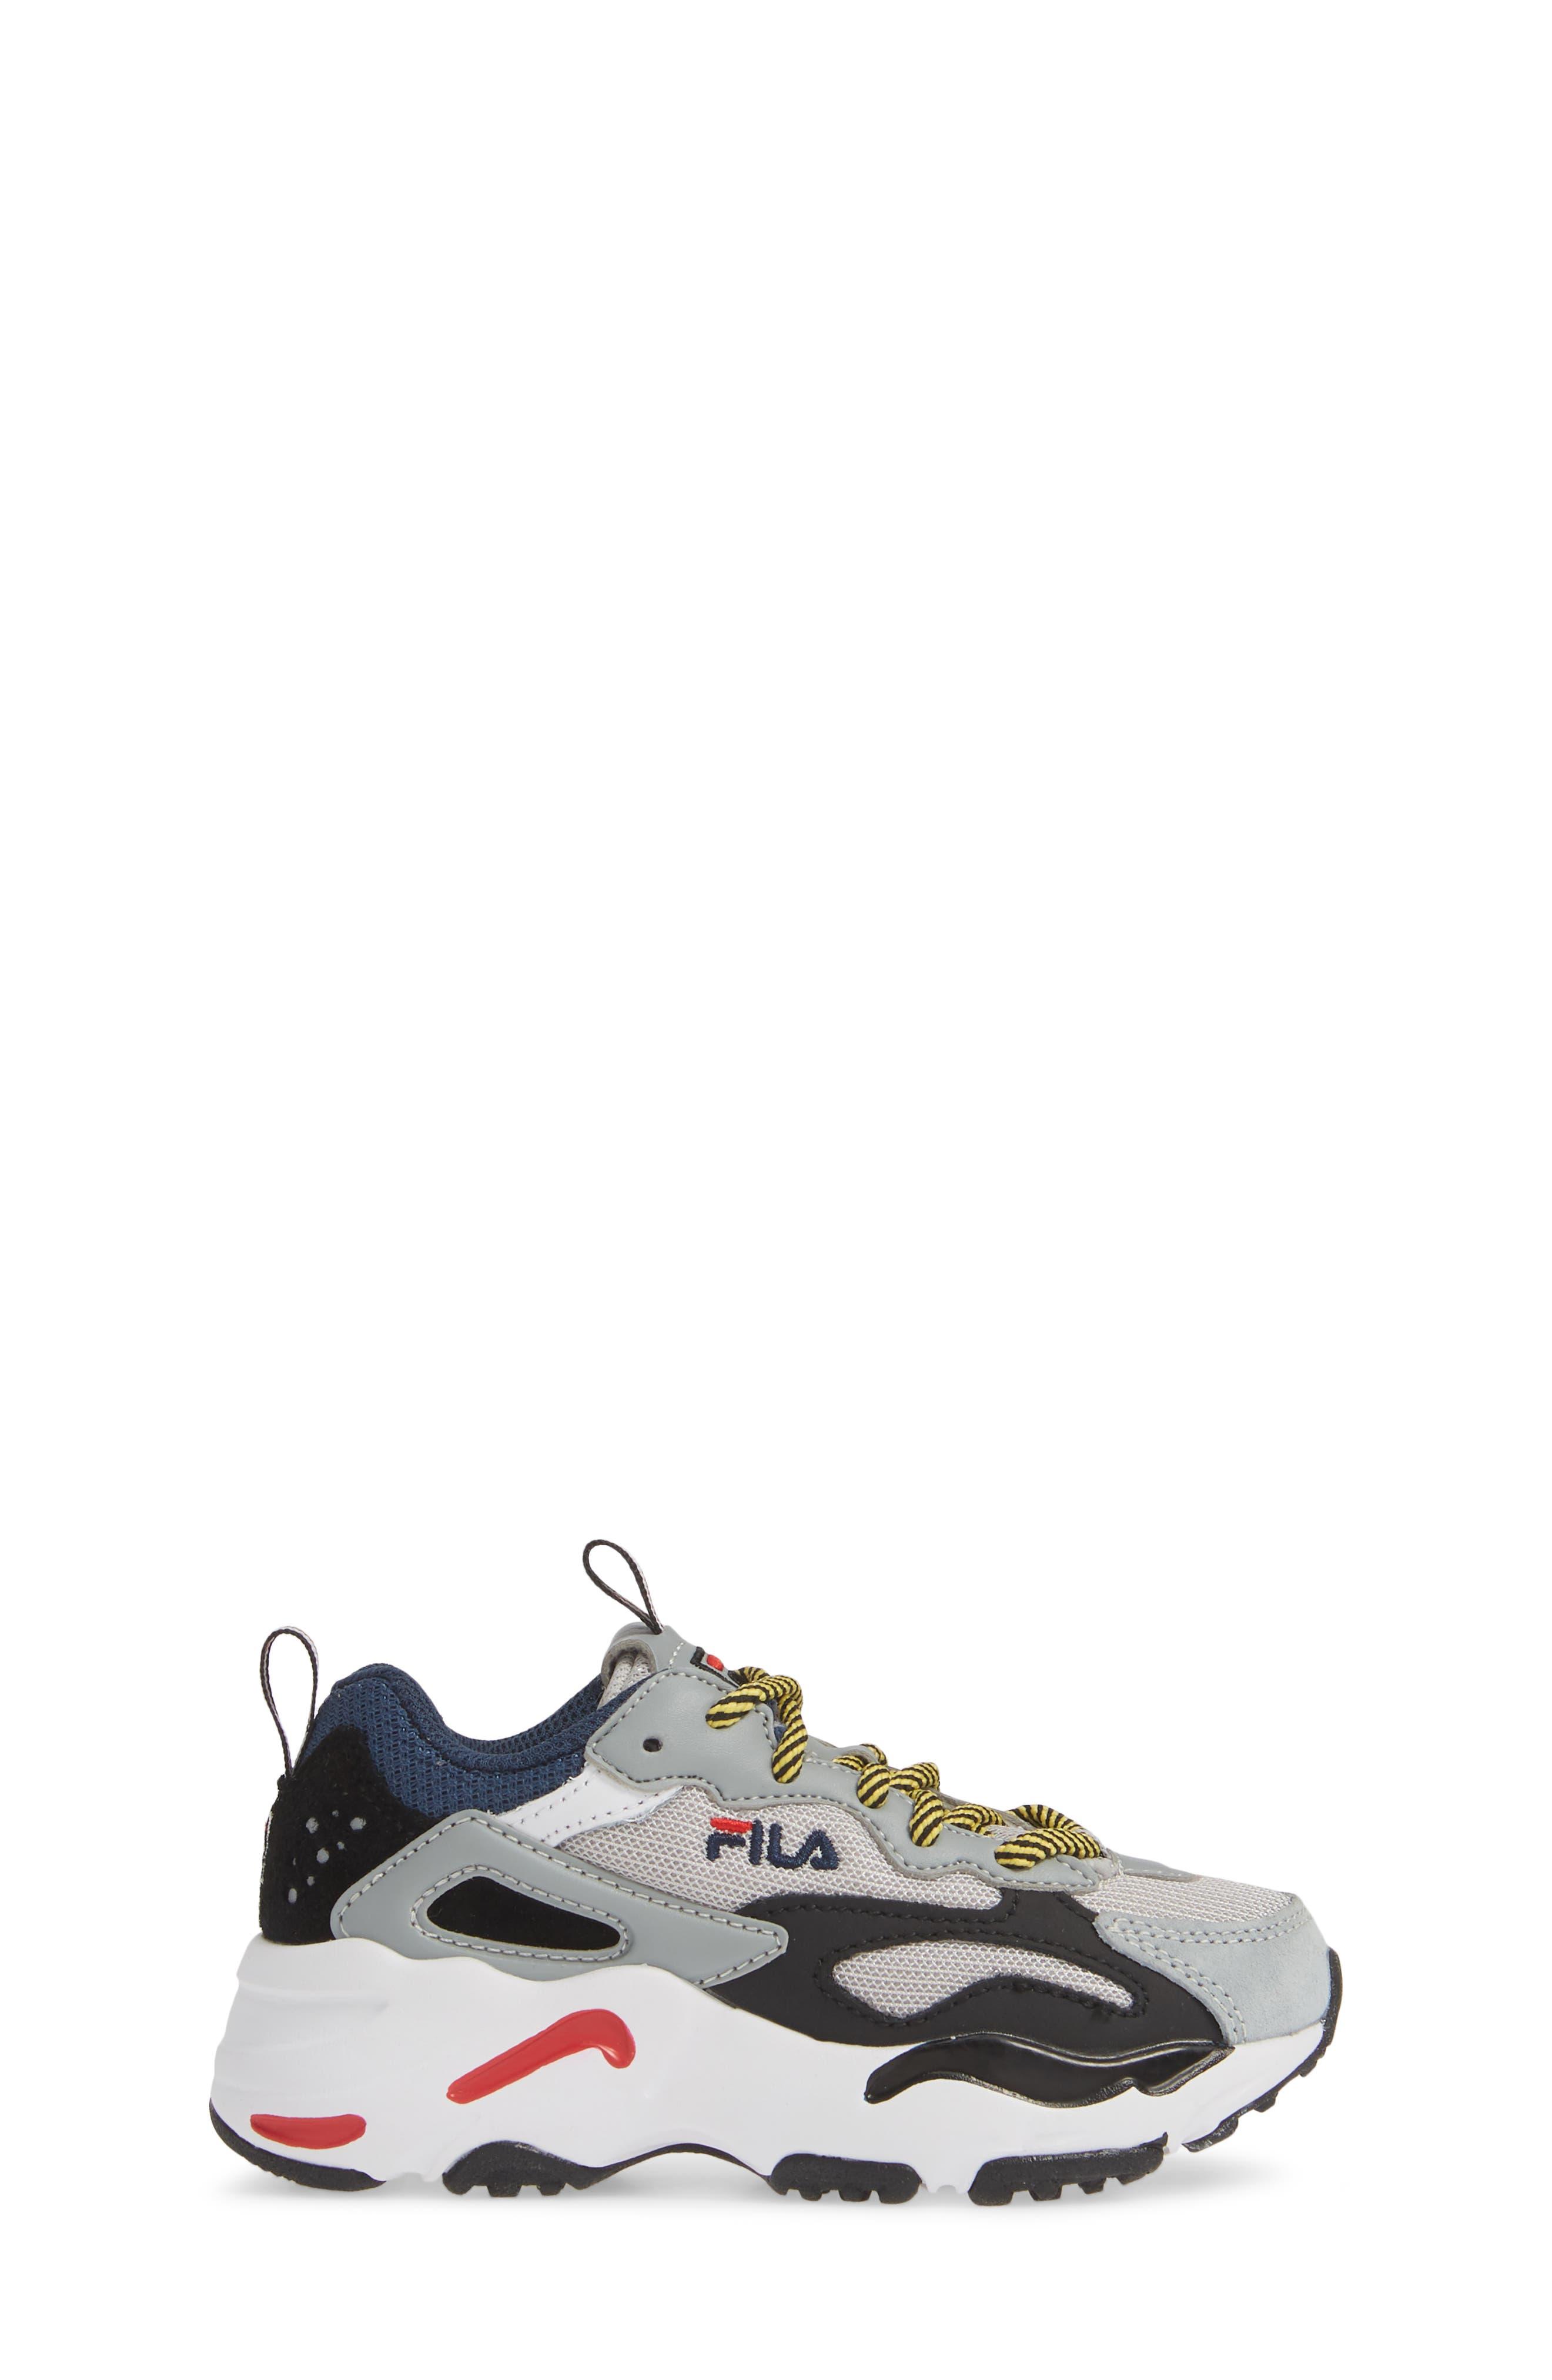 FILA,                             Ray Tracer Sneaker,                             Alternate thumbnail 3, color,                             VAPOR BLUE/ HIGHRISE/ BLACK